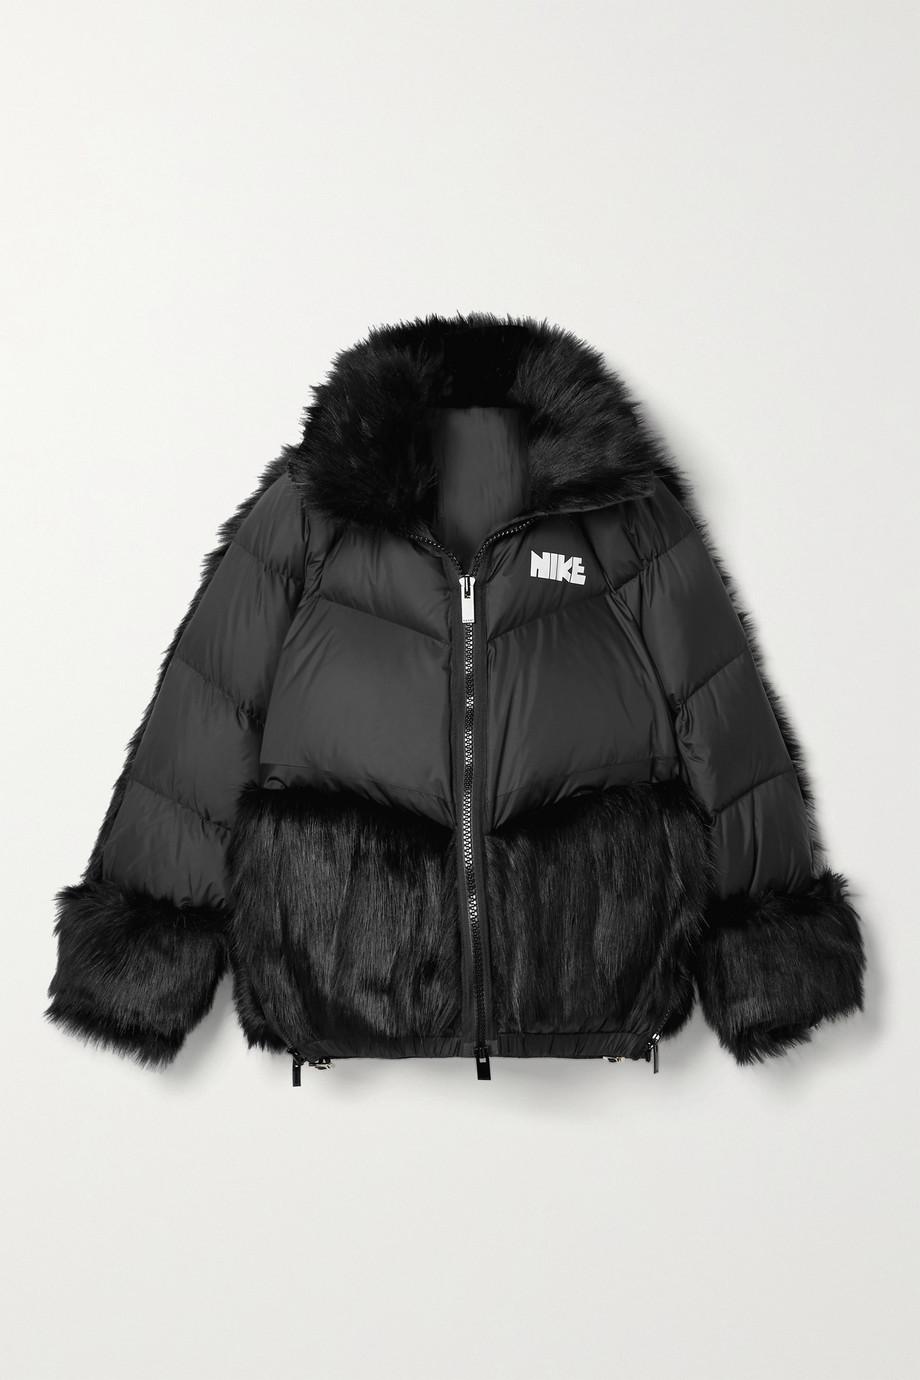 Nike + Sacai NRG Oversized-Daunenjacke aus gestepptem Shell mit Kapuze und Faux-Fur-Besätzen